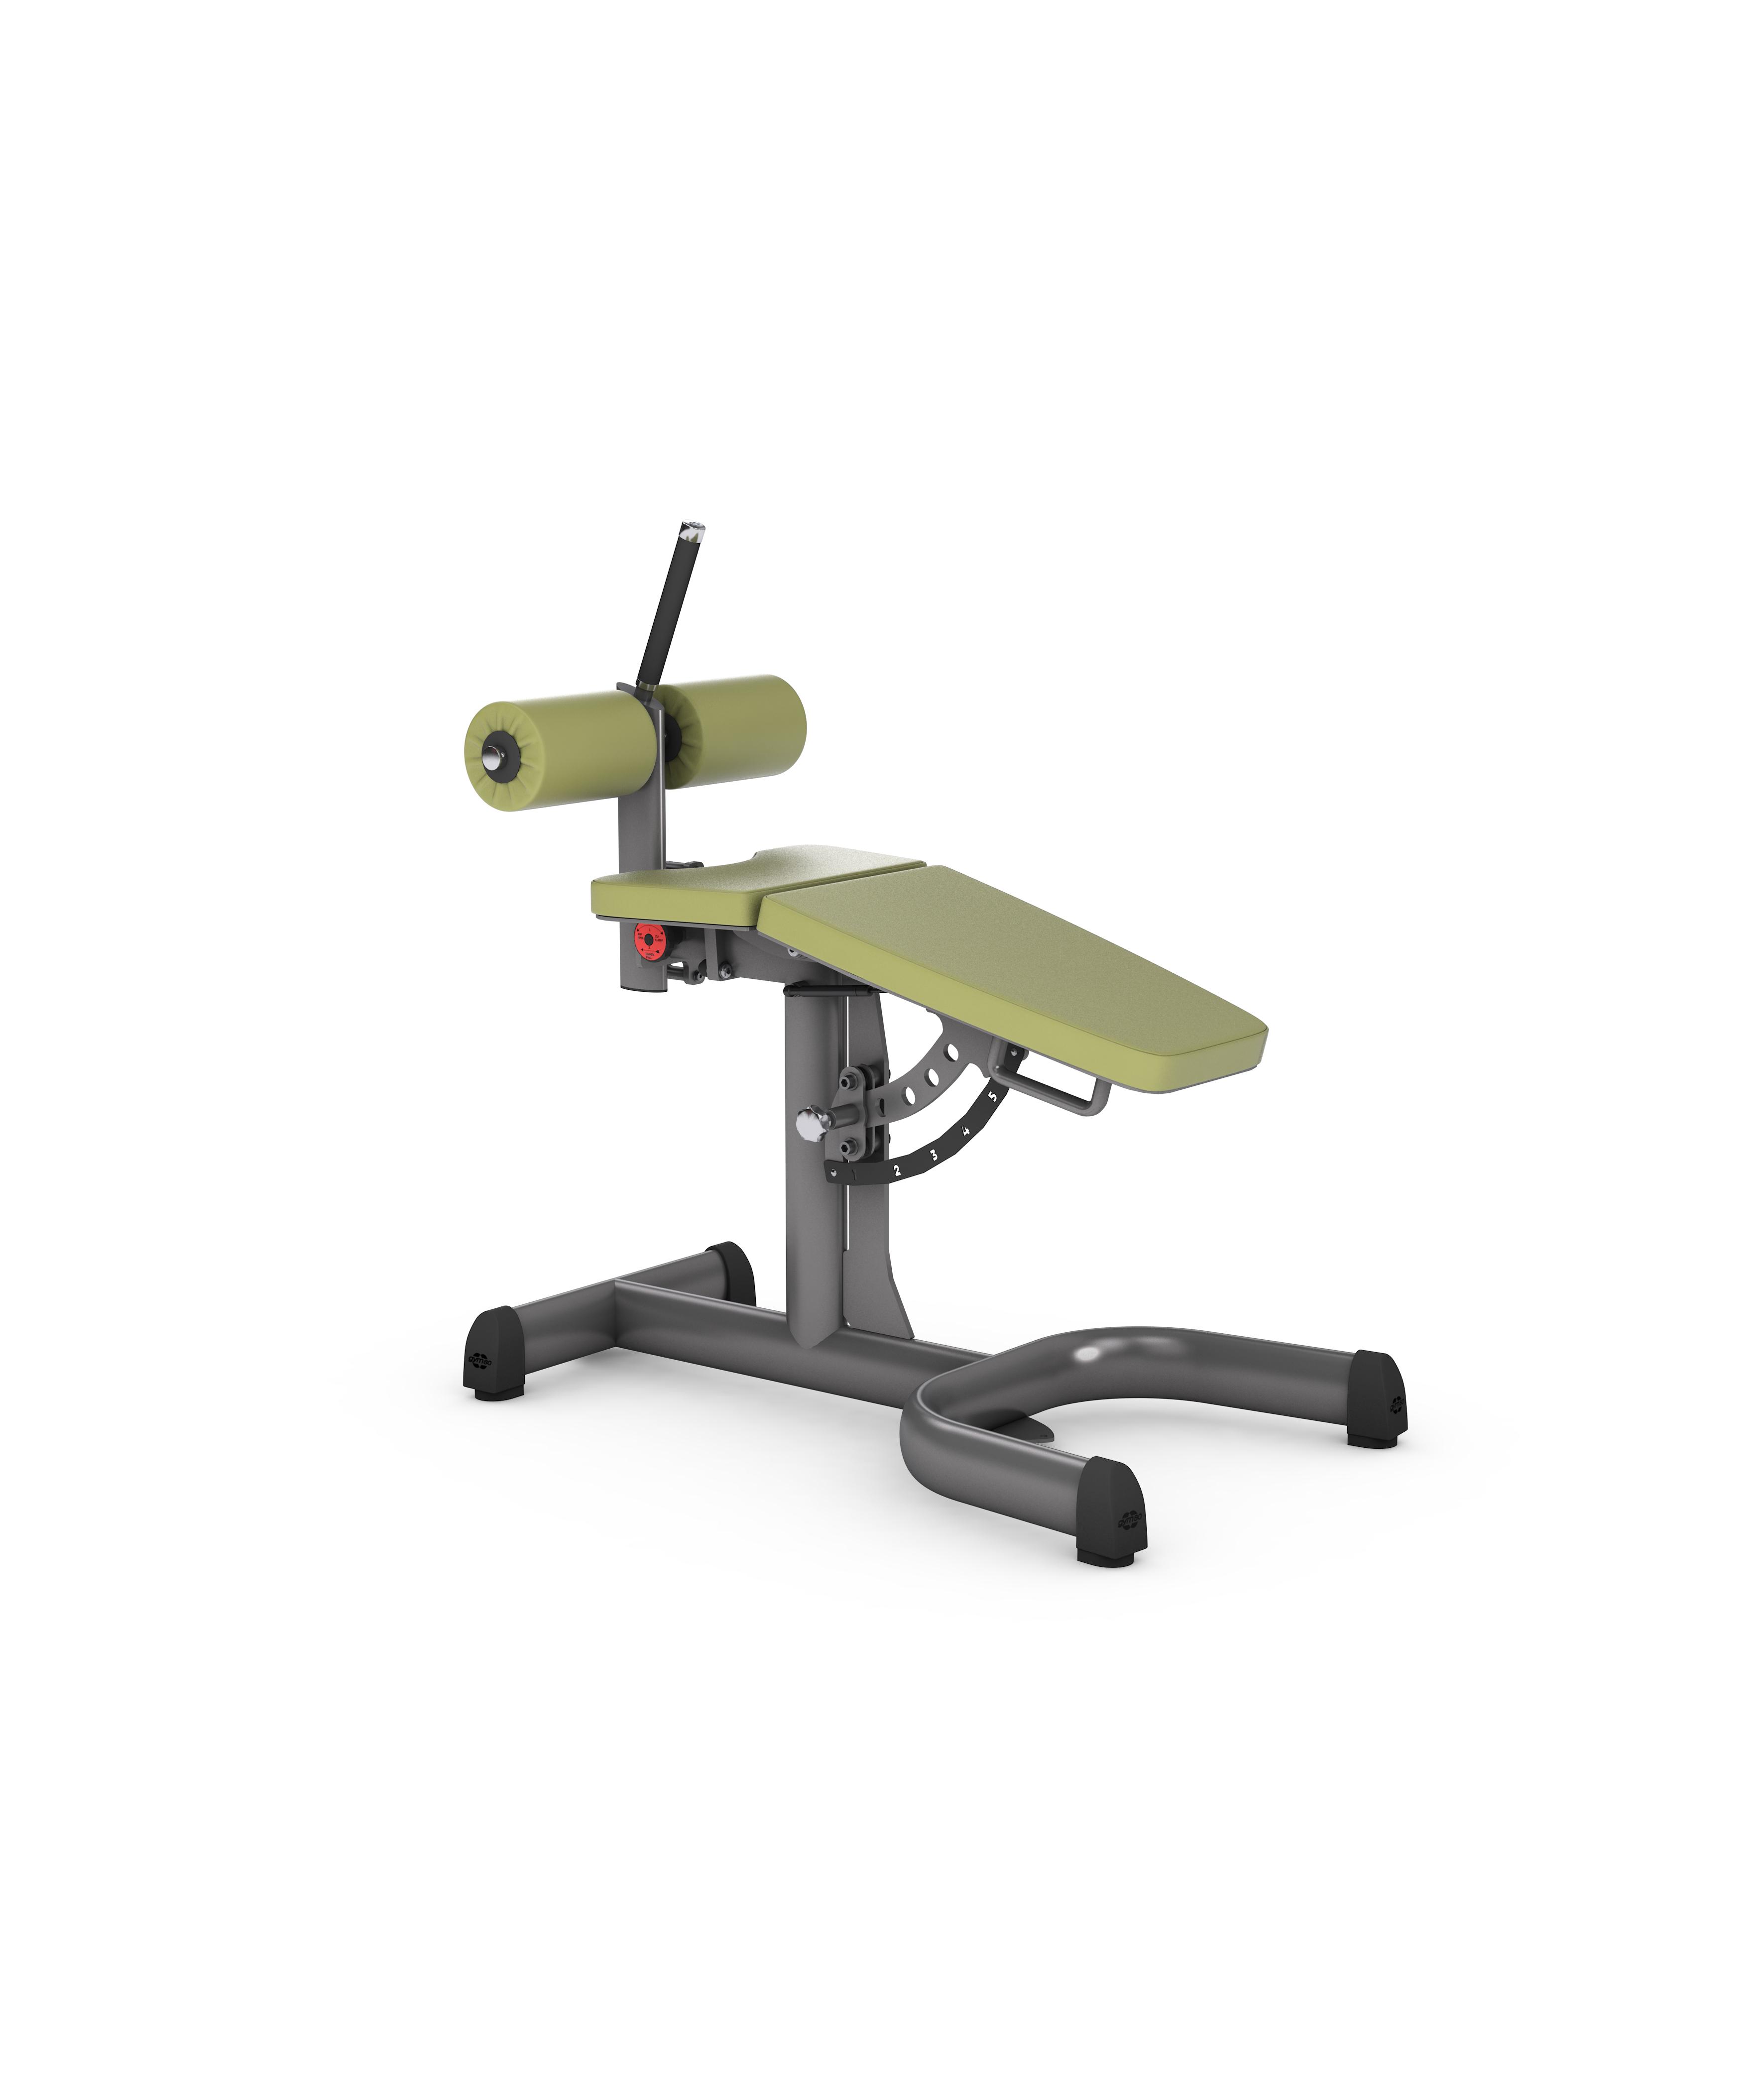 gym80 Basic Adjustable Roman Chair